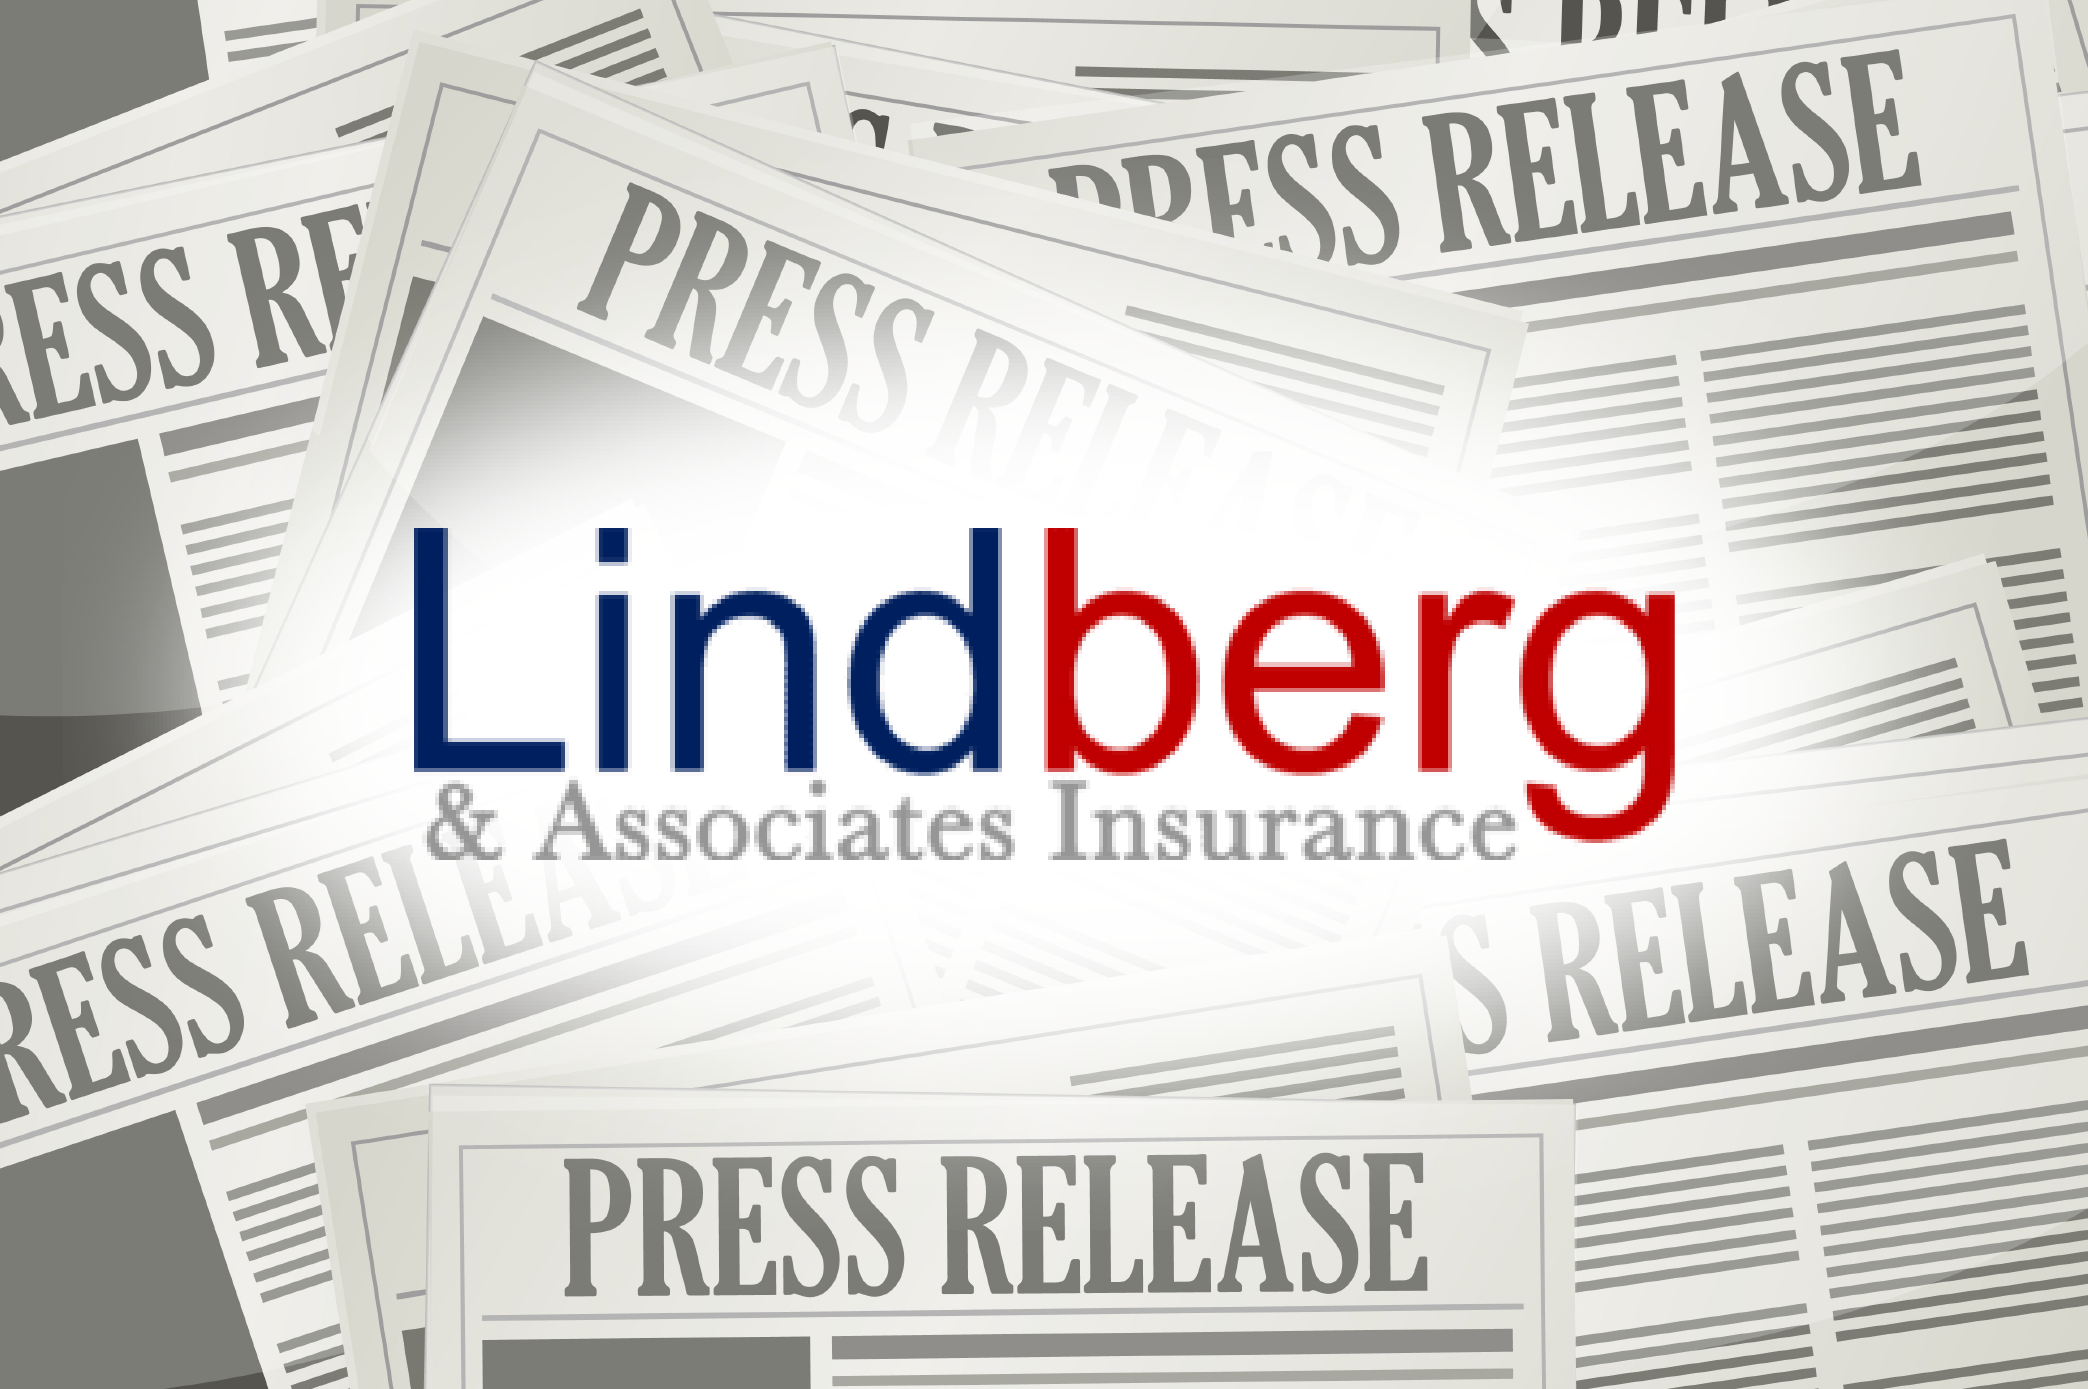 Lindberg & Associates Insurance